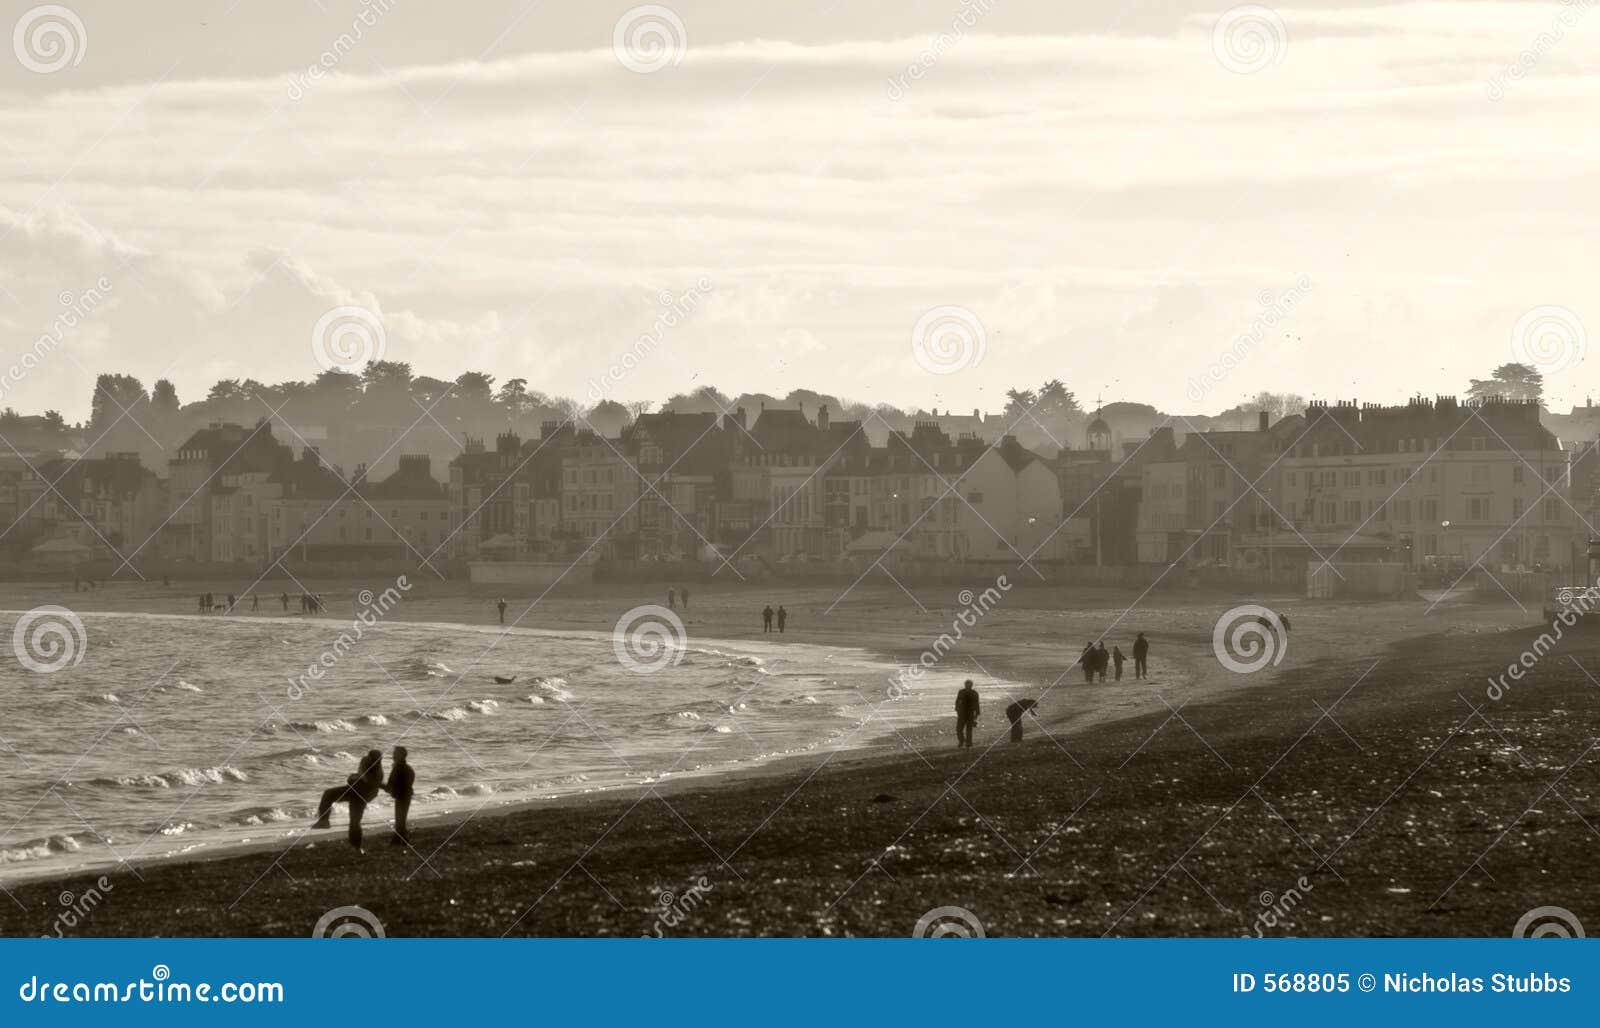 Plage de Weymouth dans Dorset, Angleterre à Noël